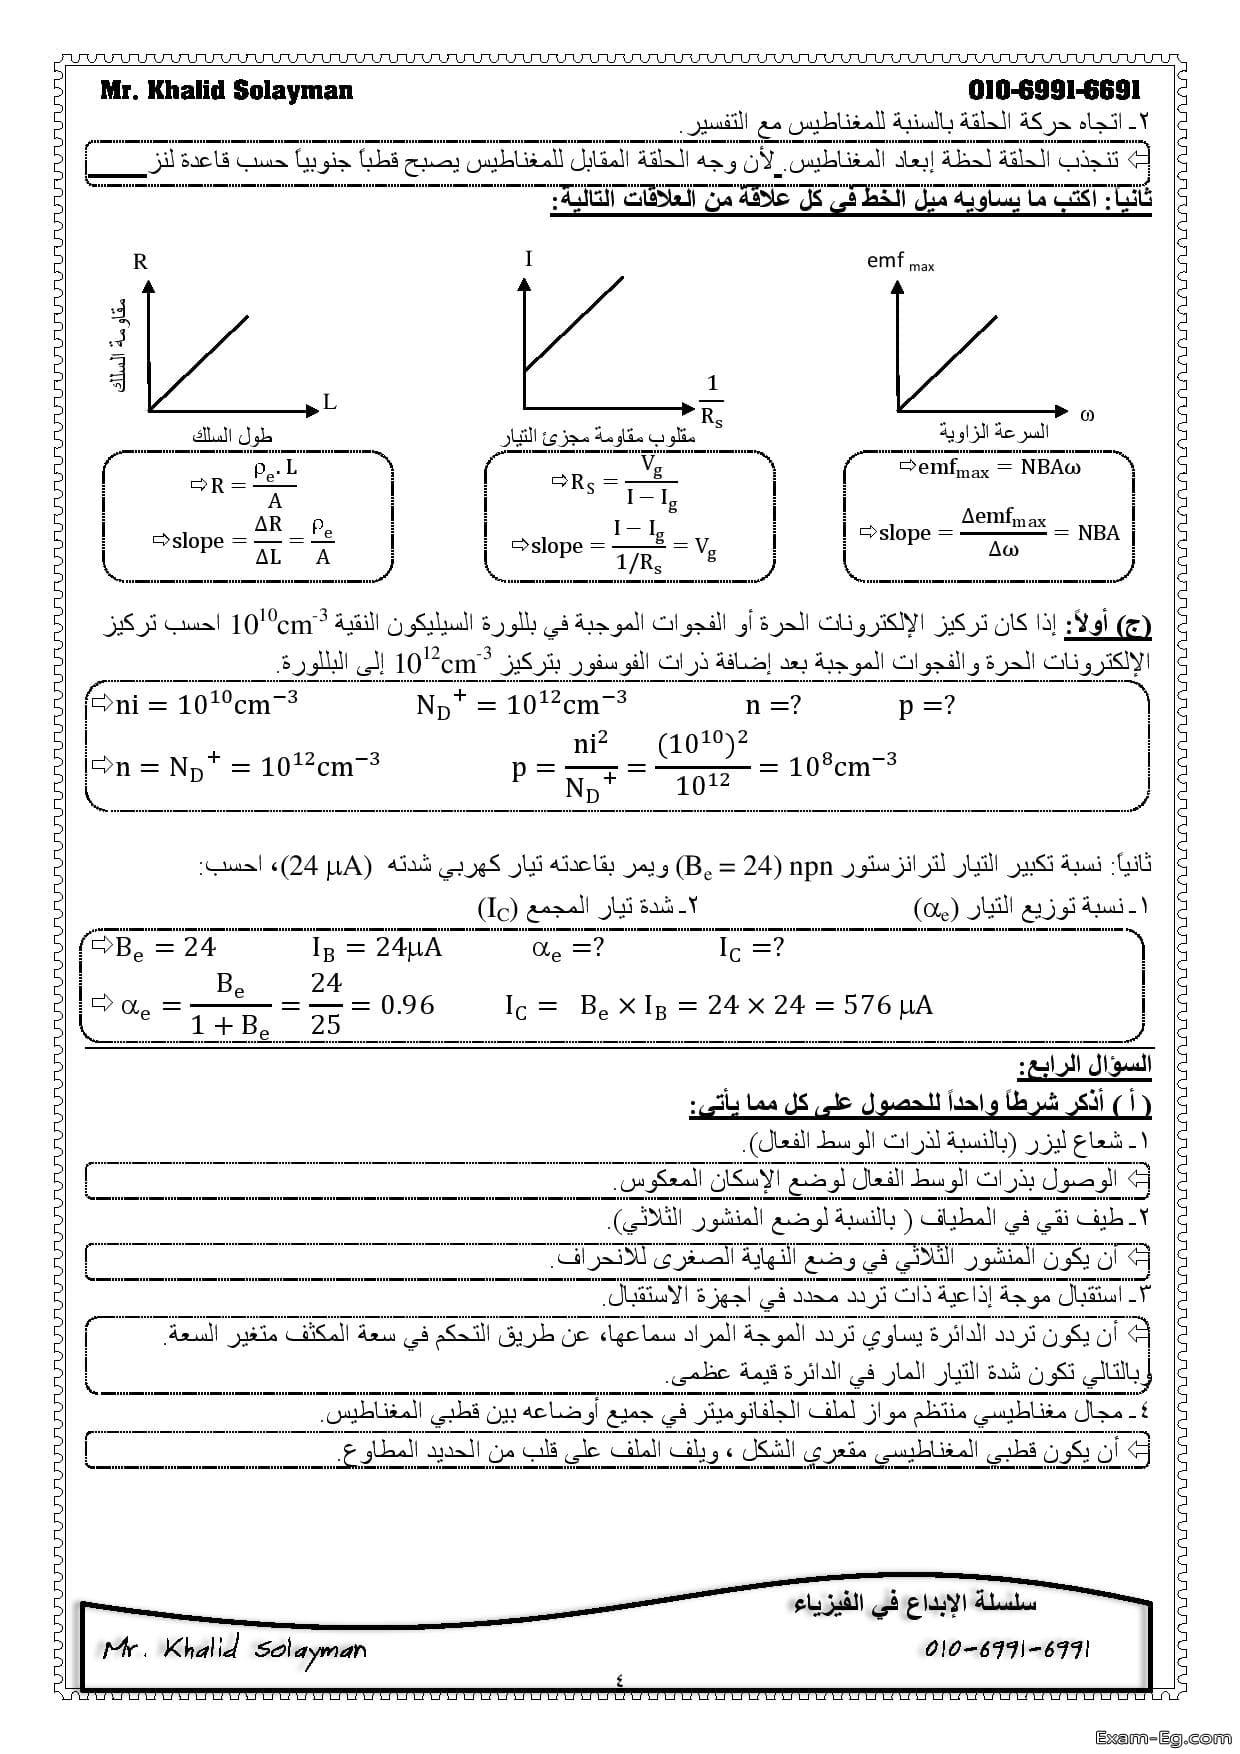 exam-eg.com_155647056849384.jpg